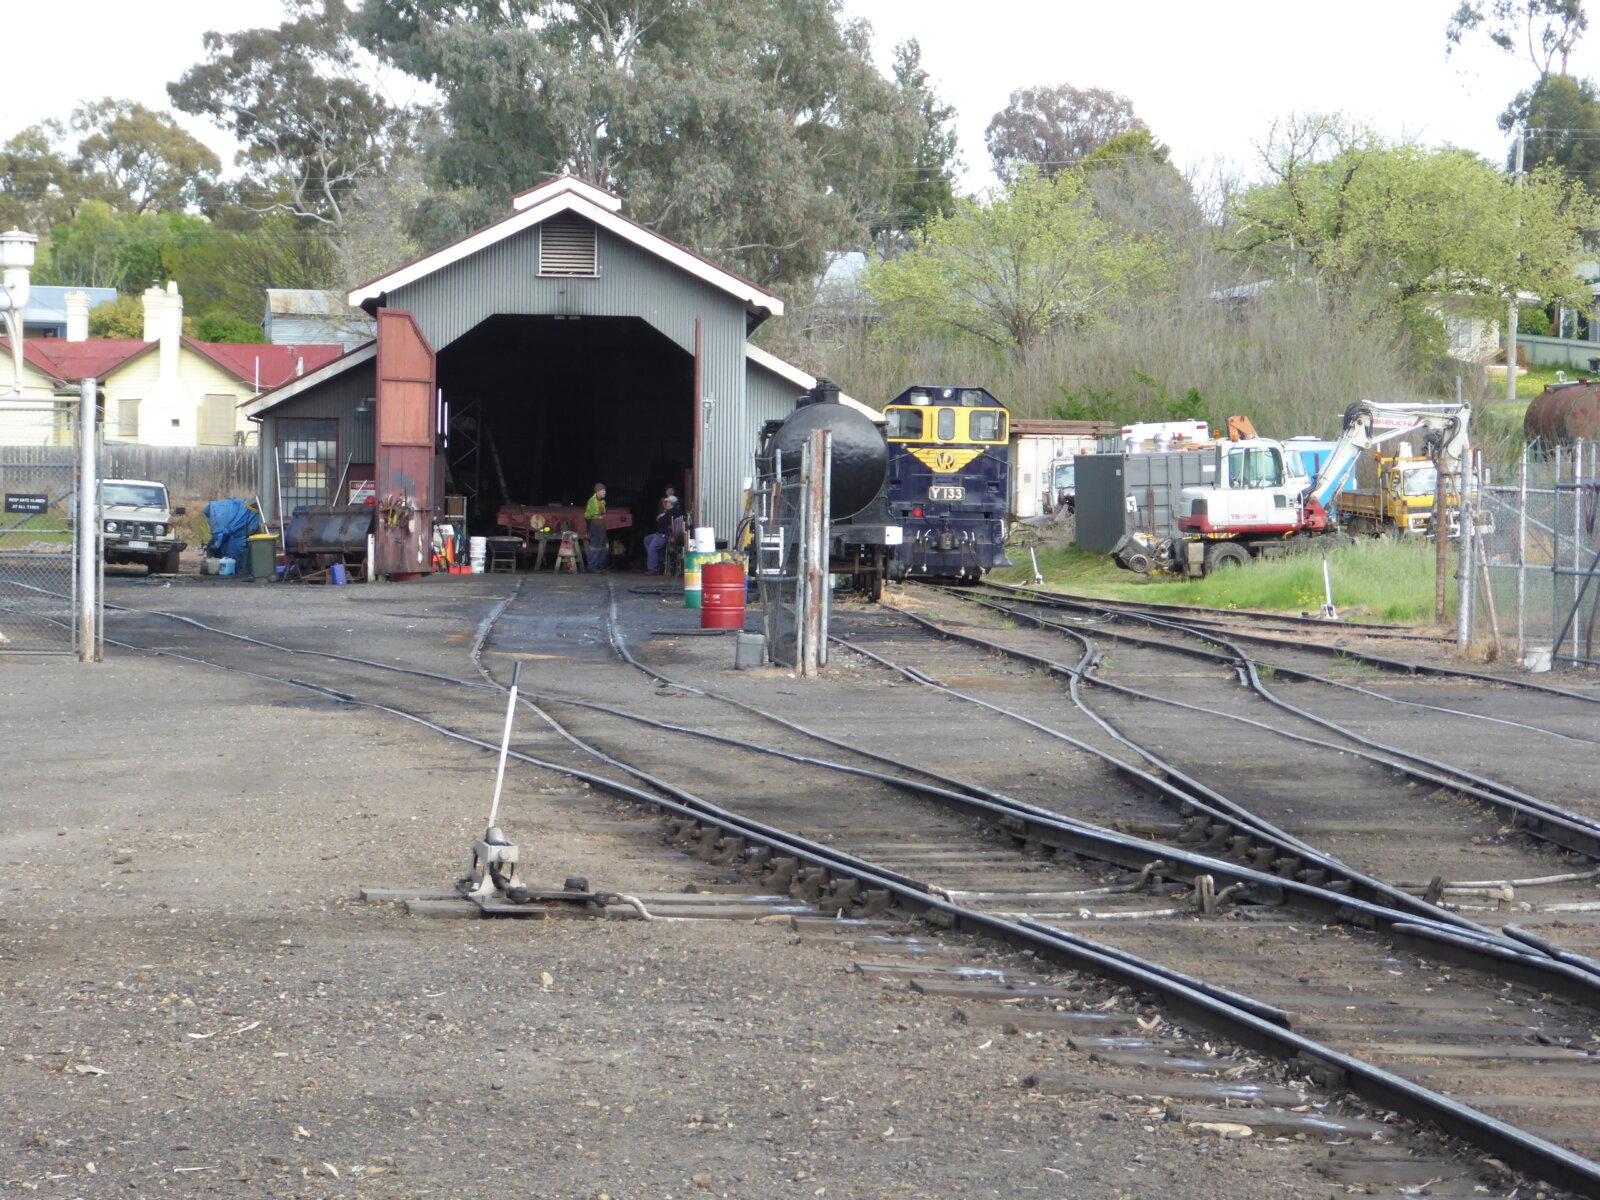 Maldon Rail yards